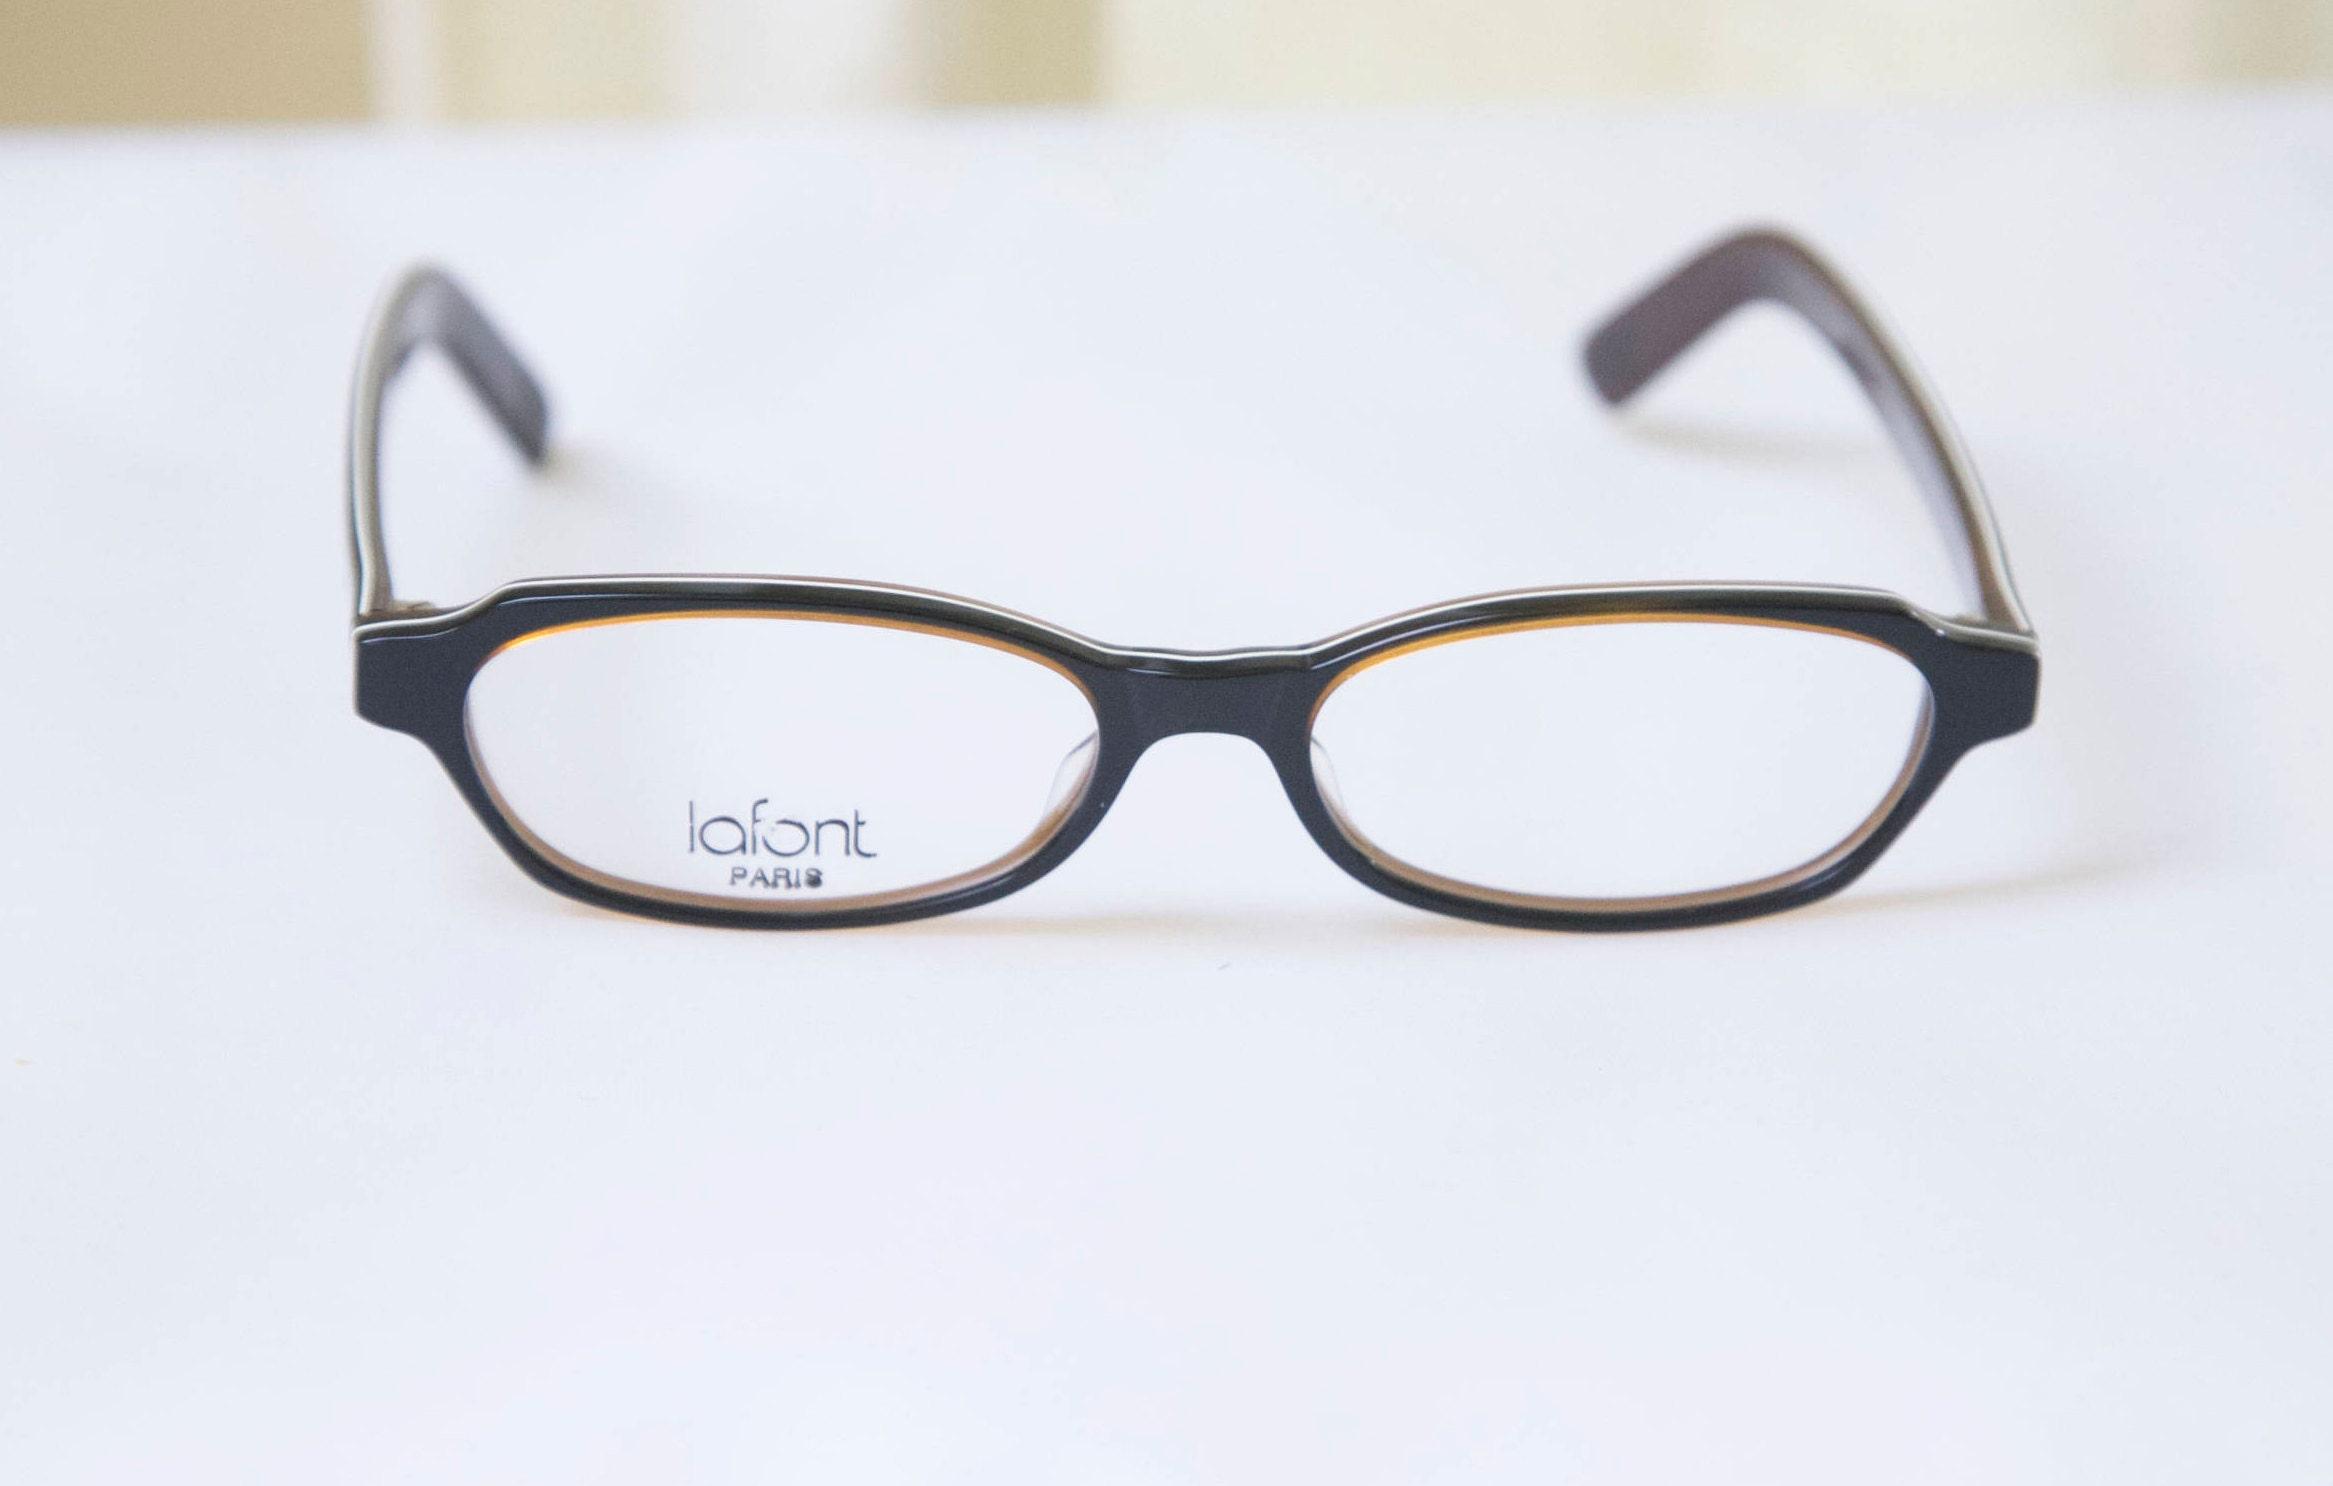 Jahrgang JEAN LAFONT Brillen Rahmen / Modell Epoque 002 / | Etsy